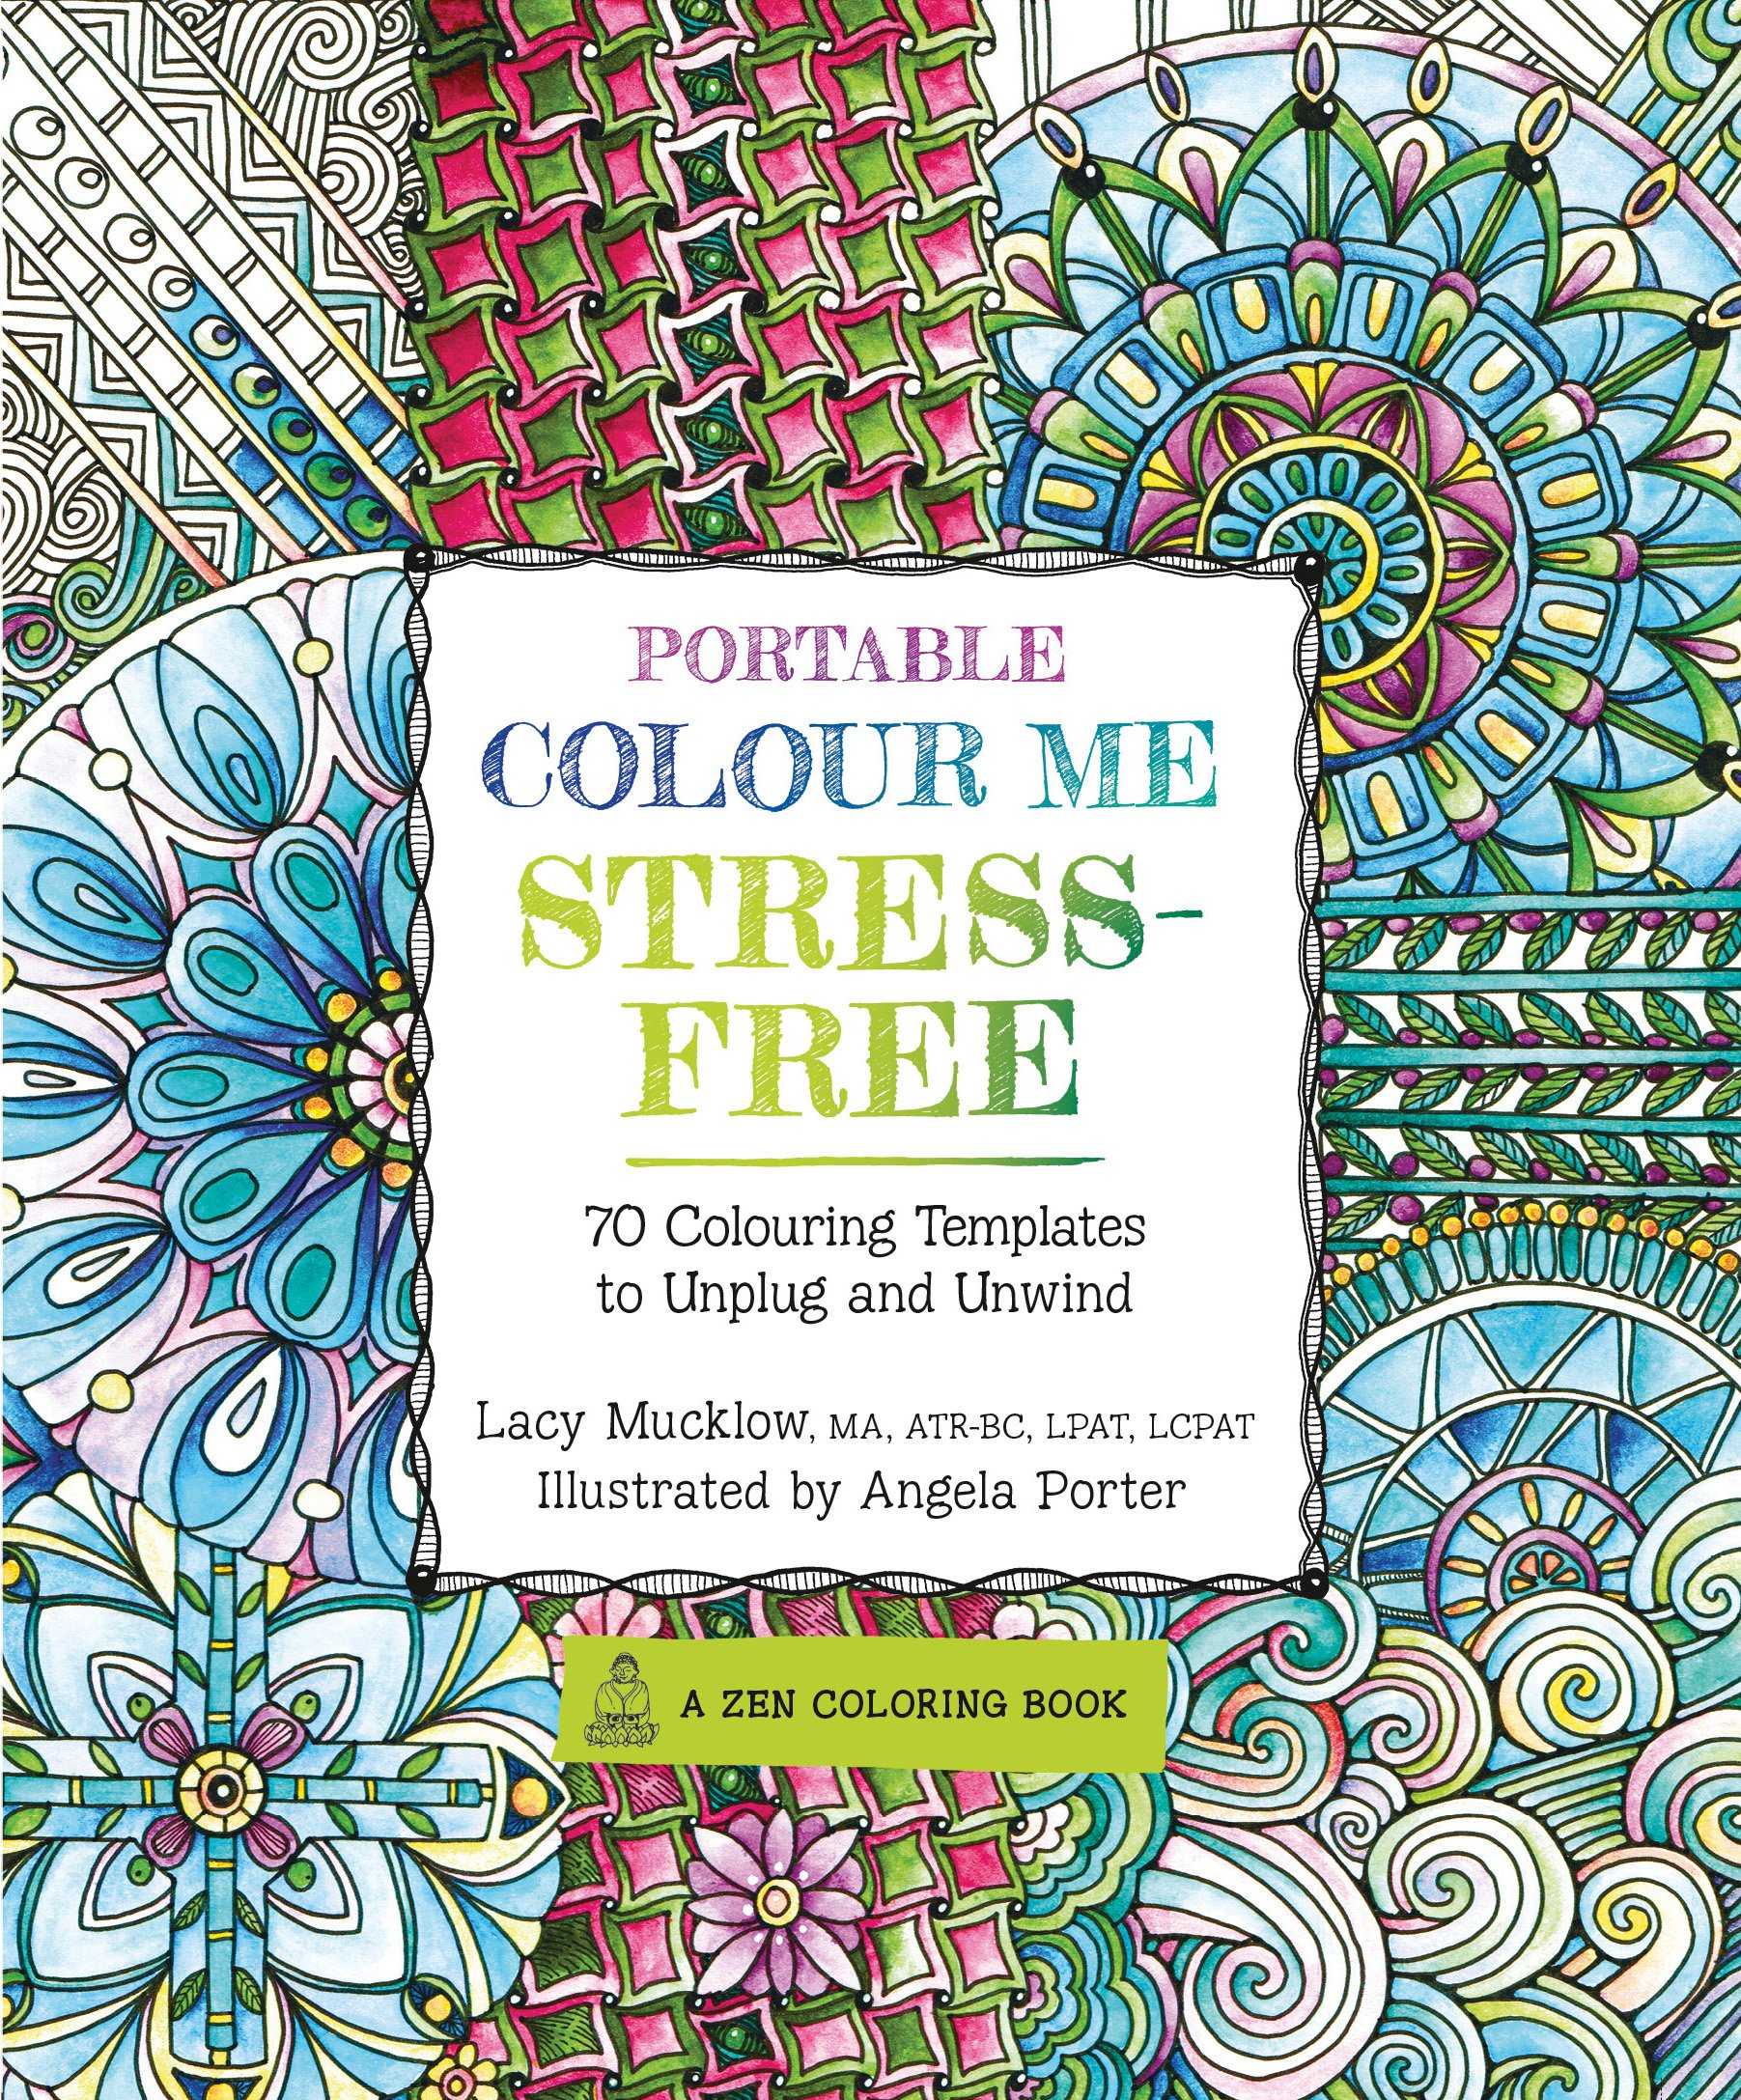 - Portable Colour Me Stress-Free: 70 Colouring Templates To Unwind